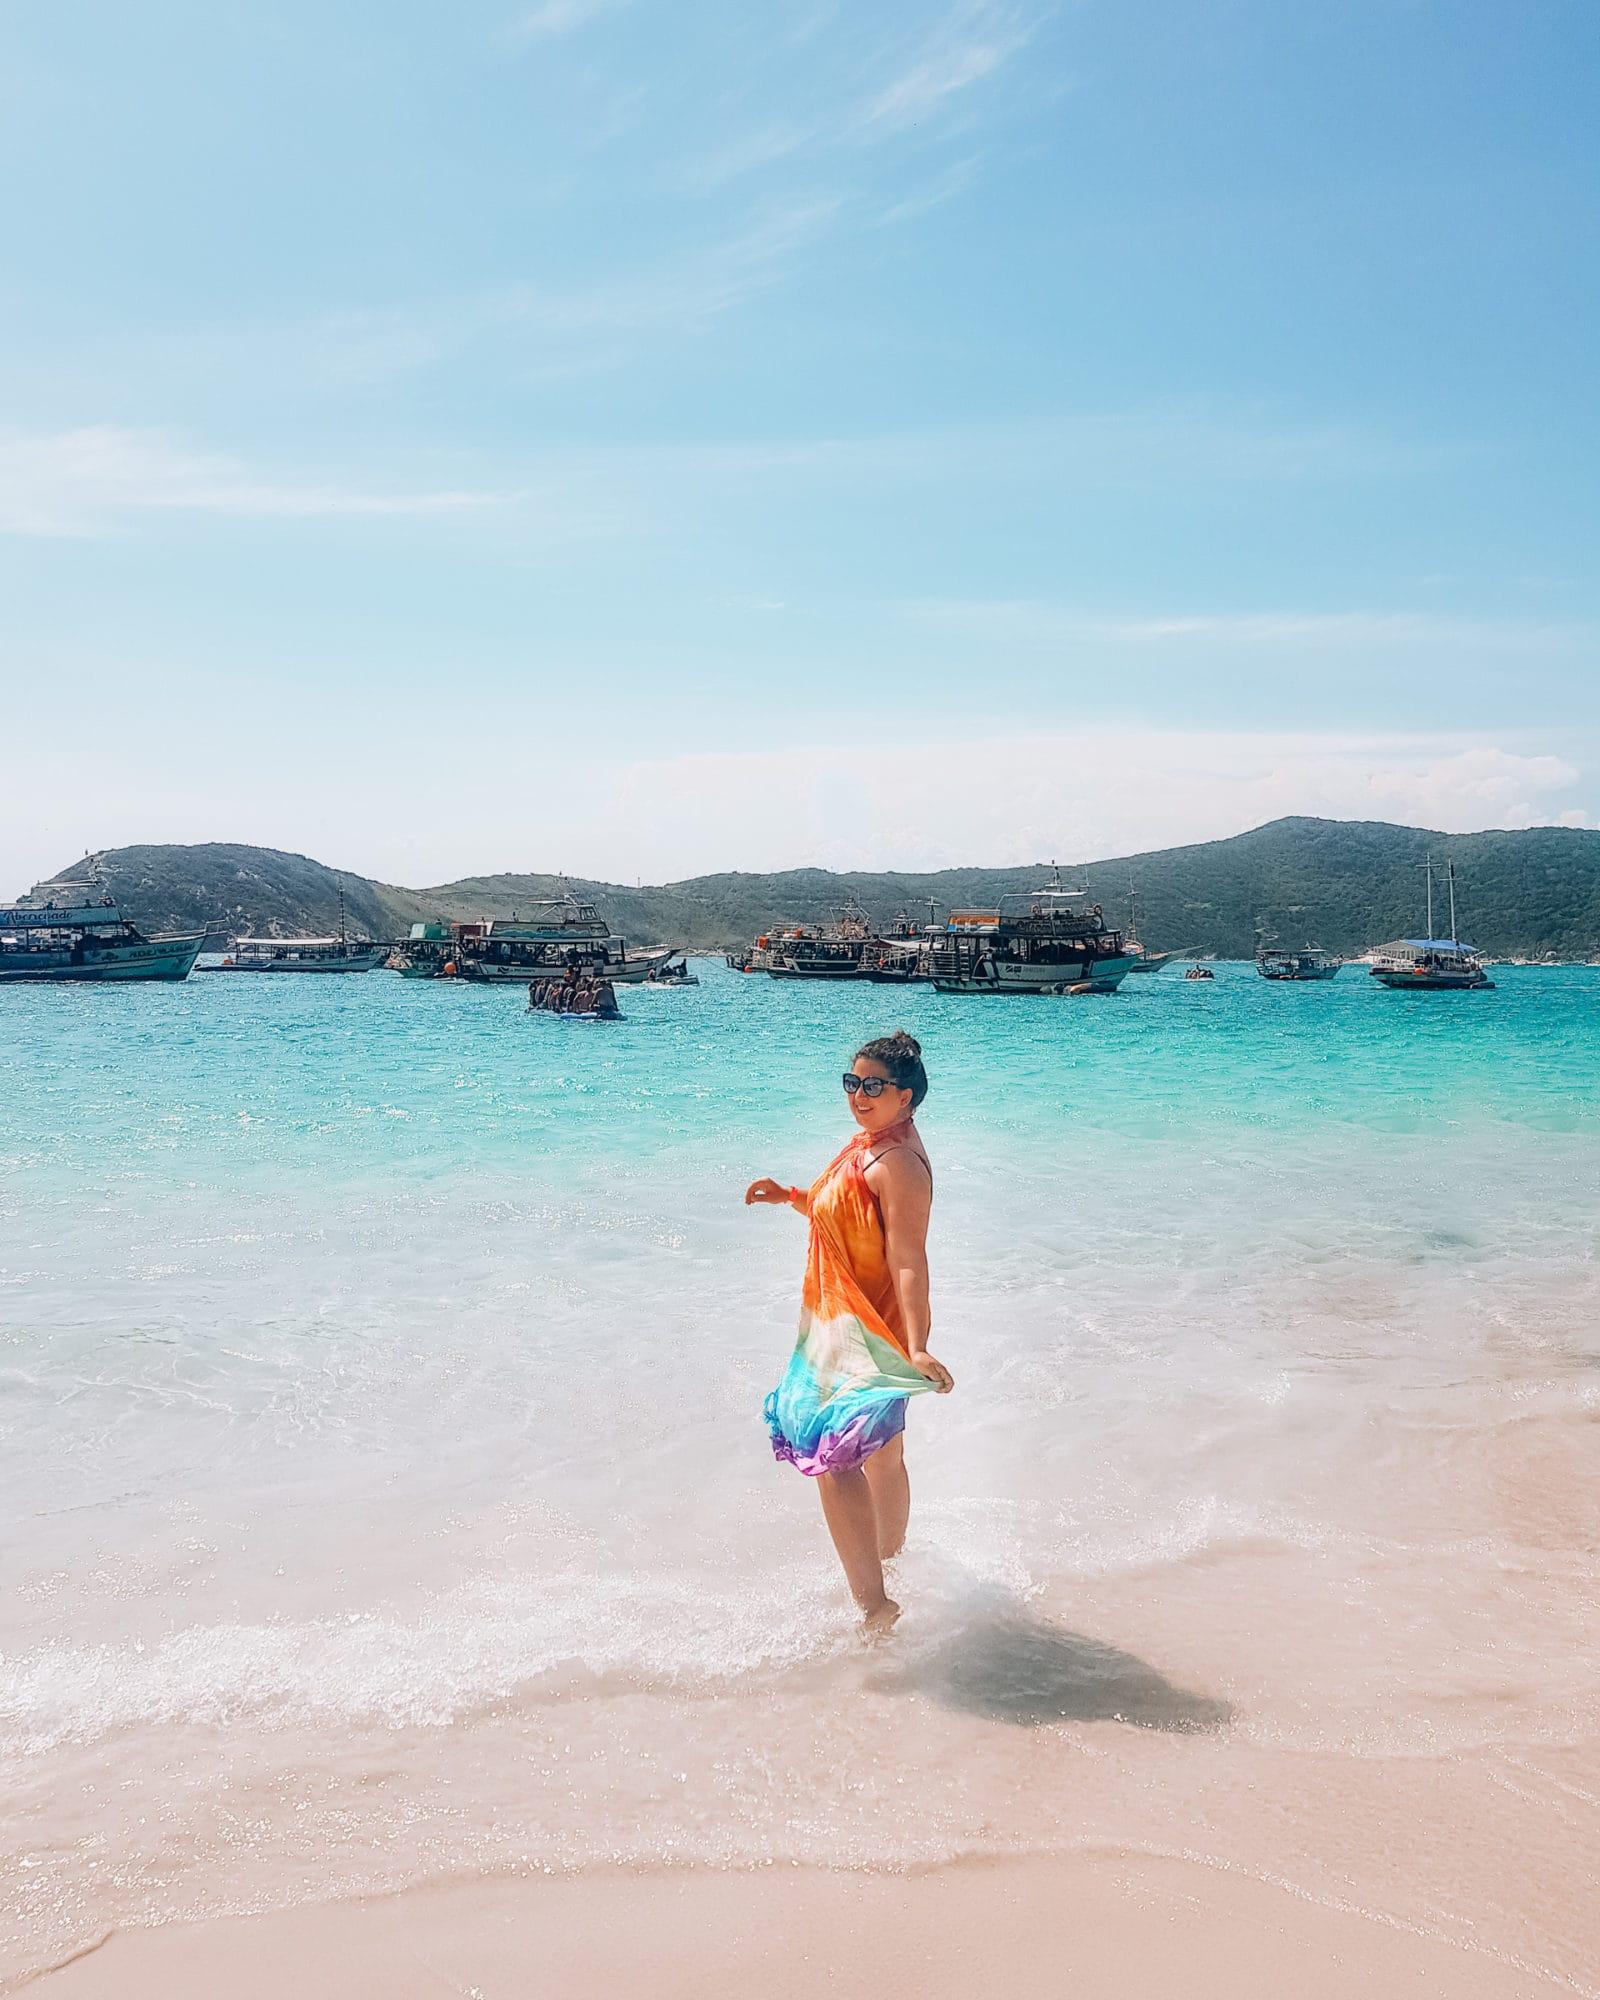 Alleinreisende Frau in Brasilien am Strand